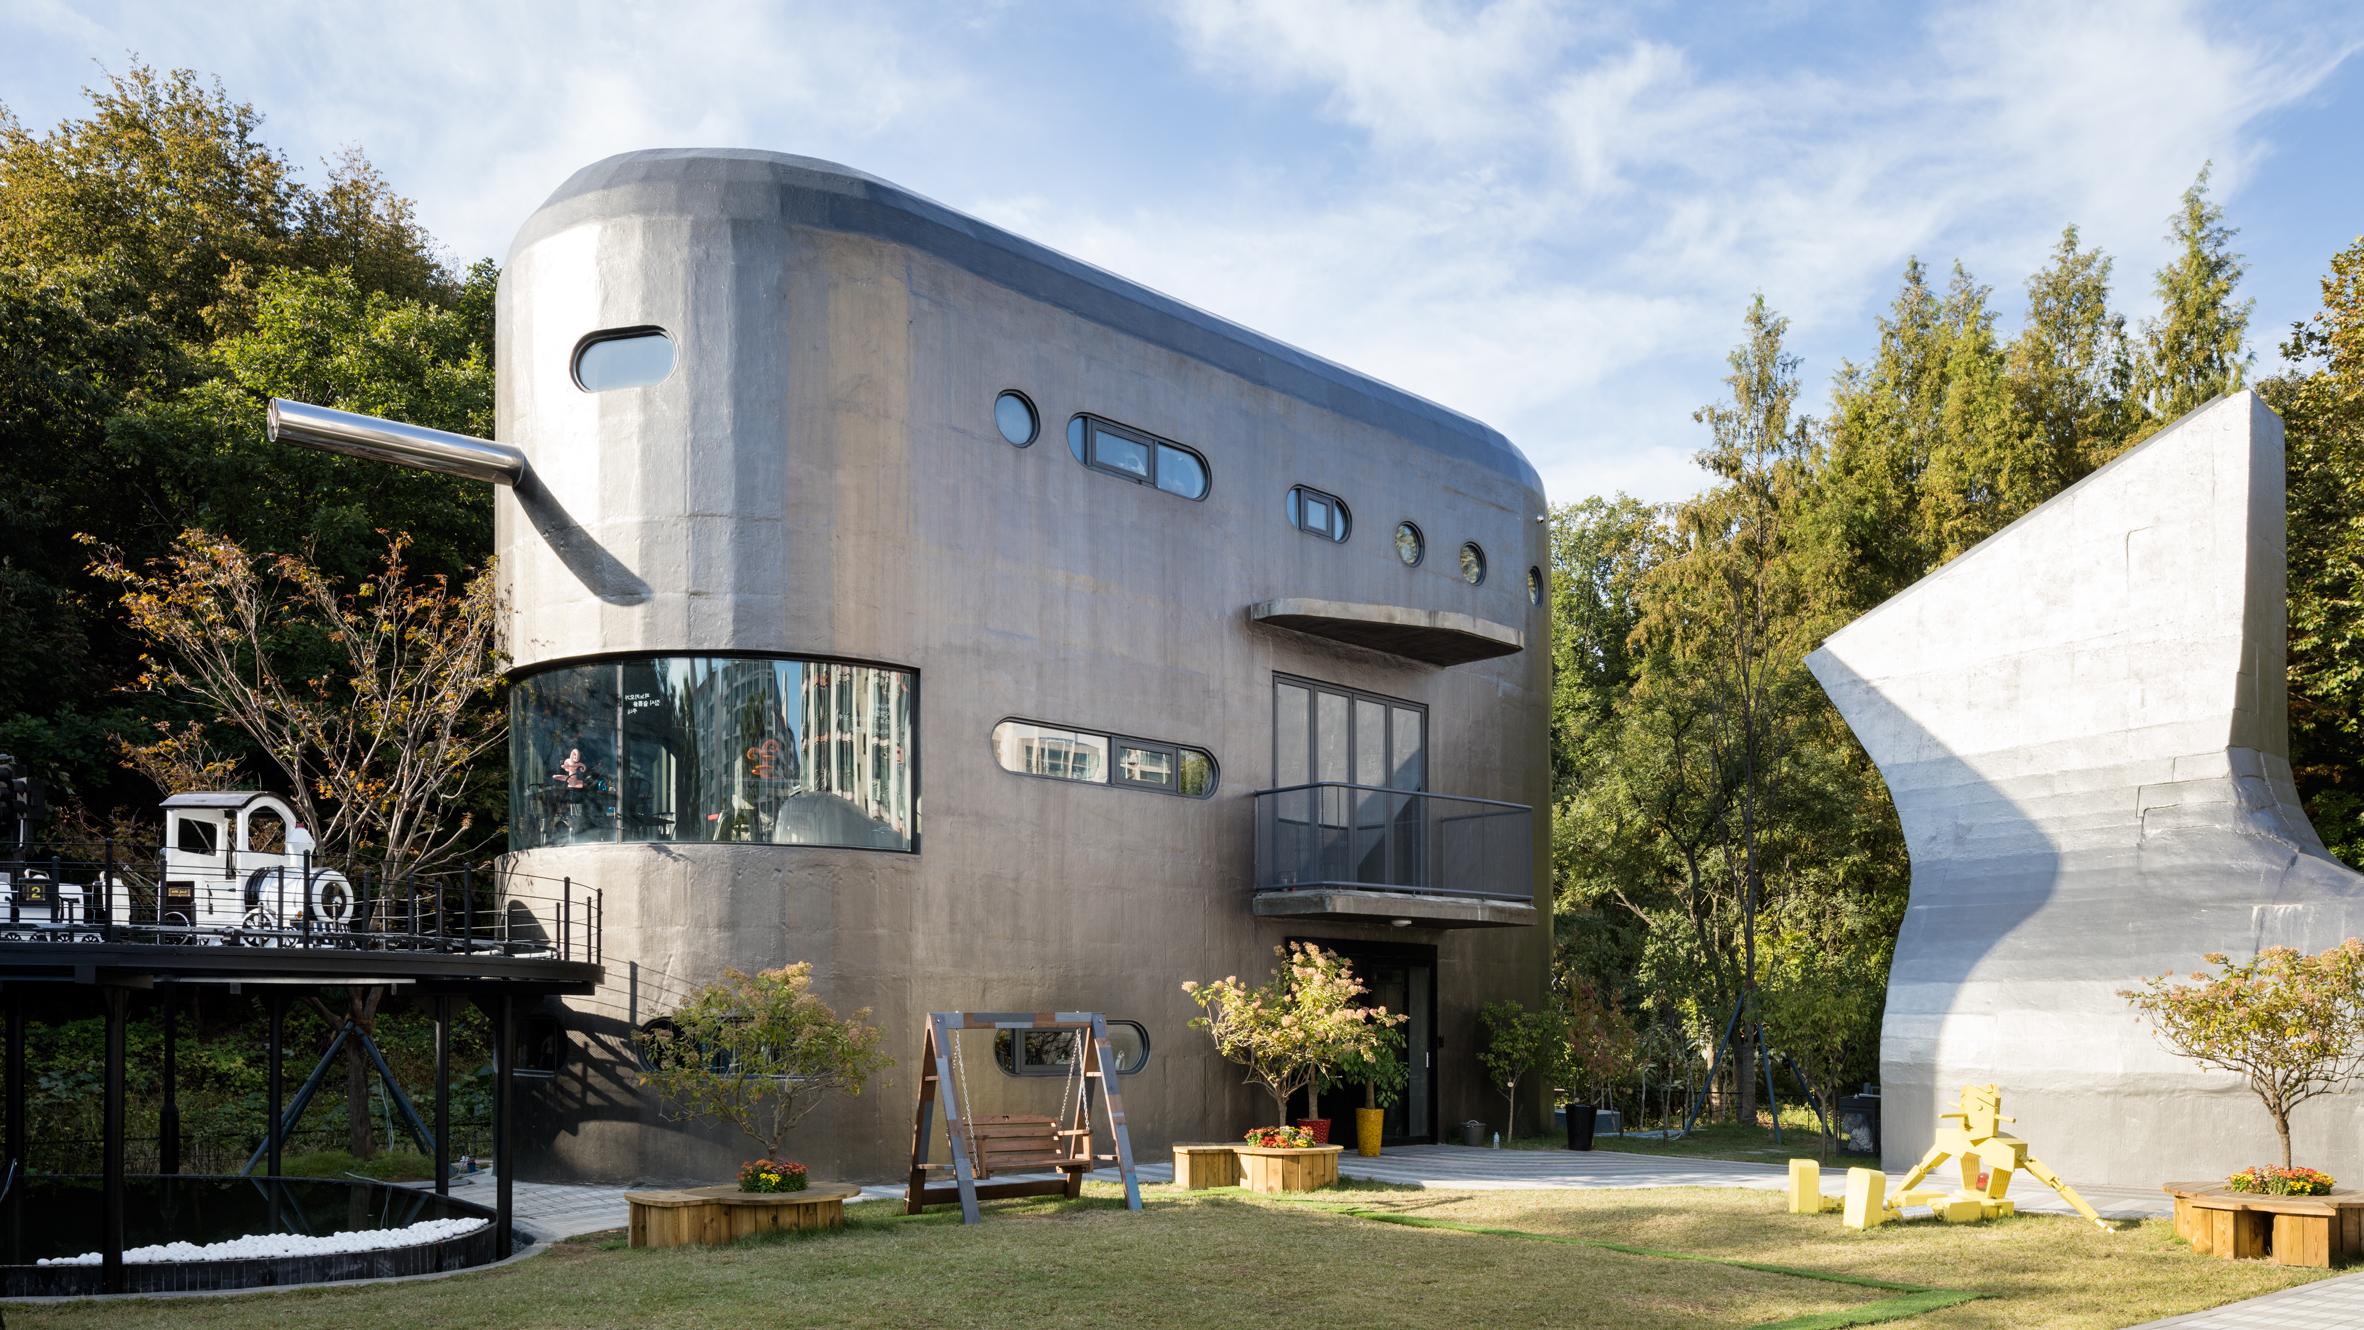 pino-familia-moon-hoon-architecture-korea-seoul-museum-galleries_dezeen_hero